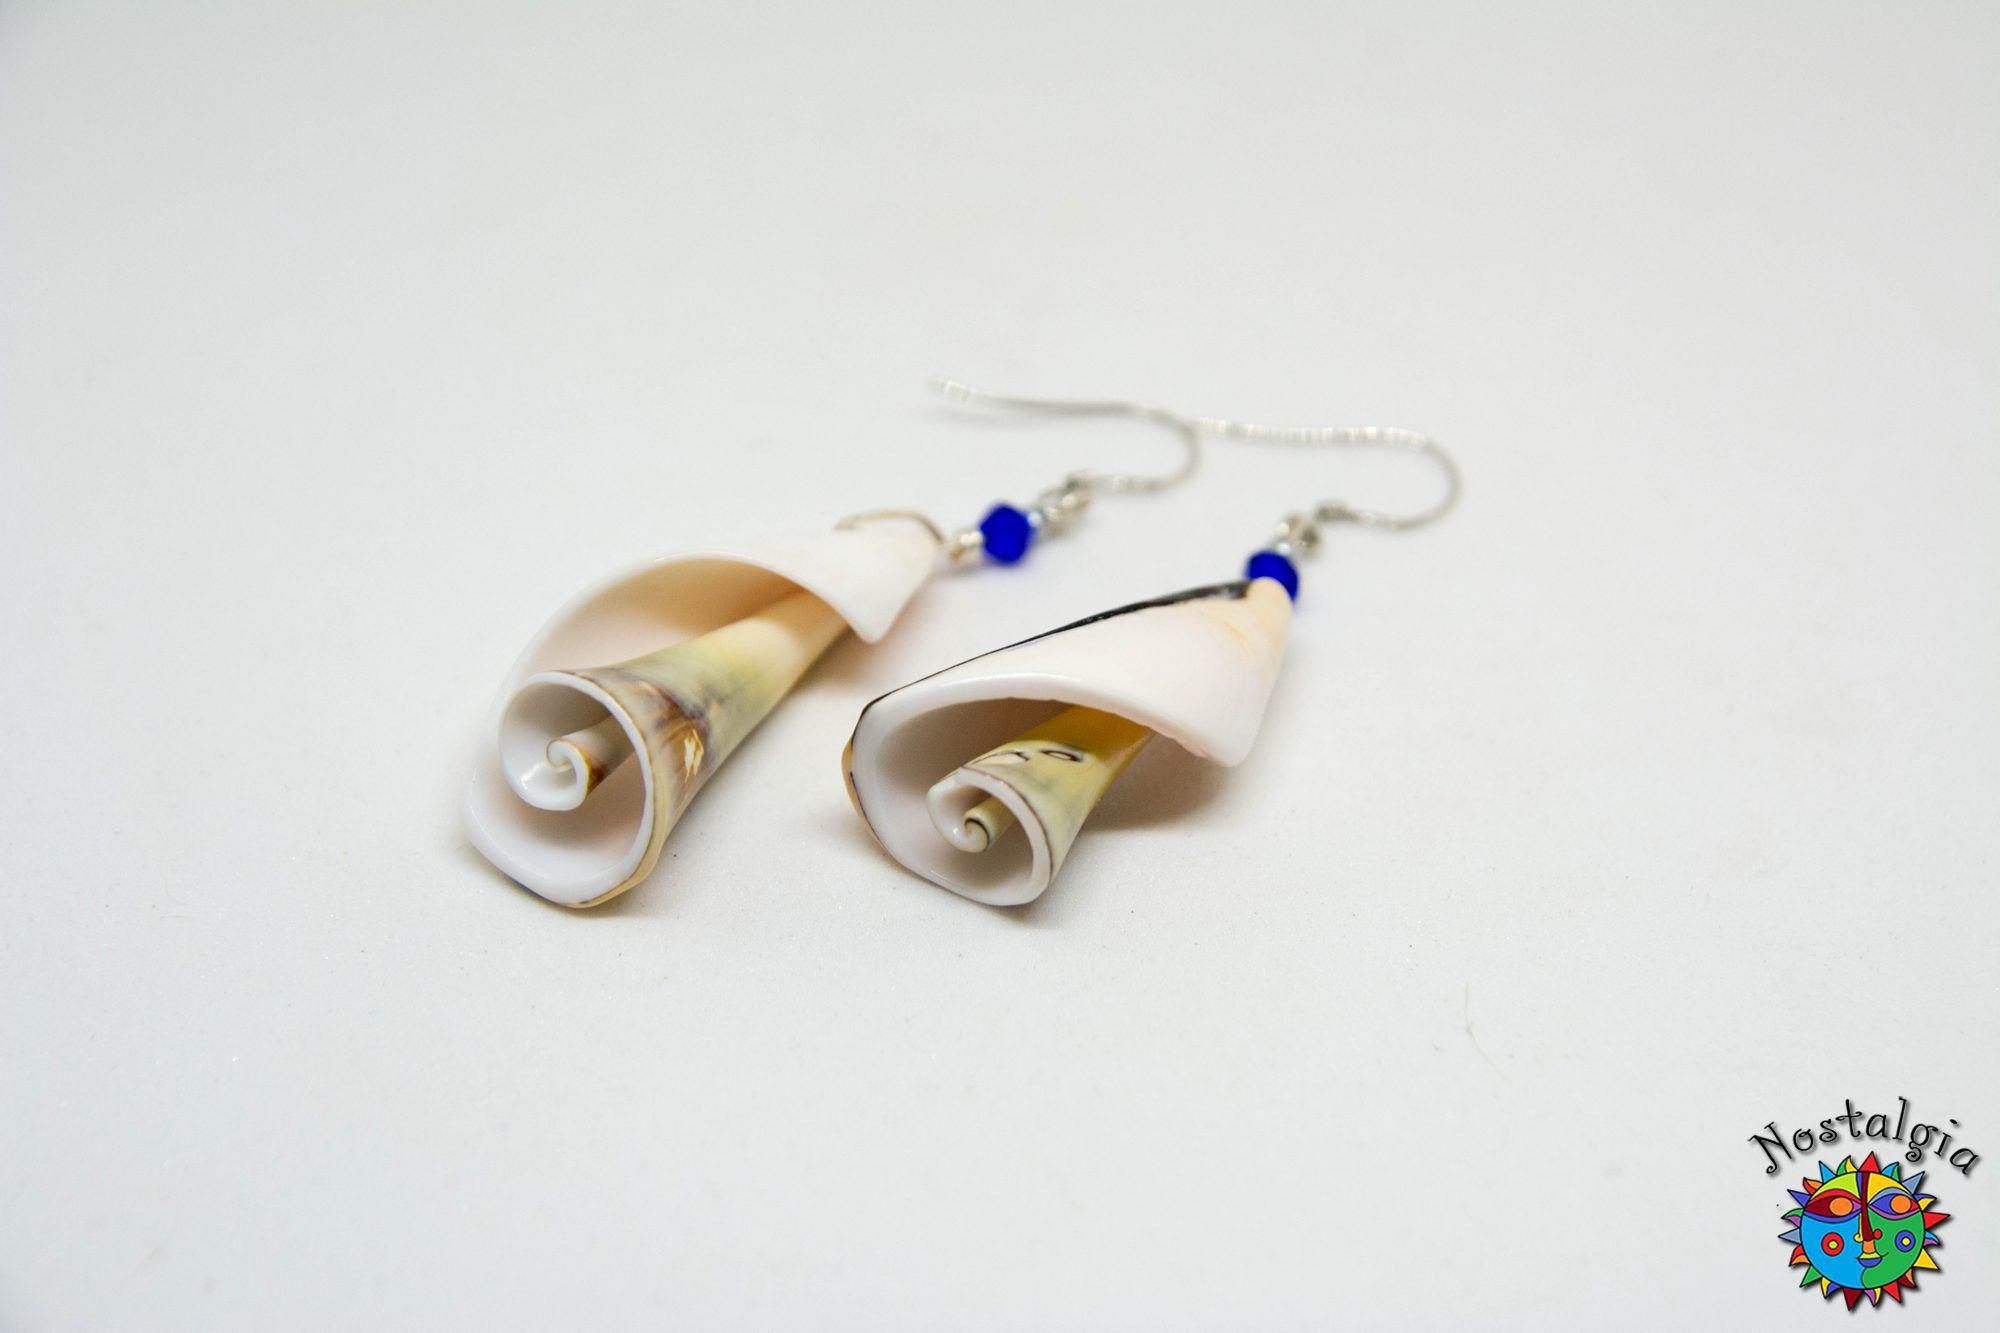 9f66b4a4d2 Σκουλαρίκια με κοχύλια Μπλε - Χειροποίητα είδηNostgalgia Handmade